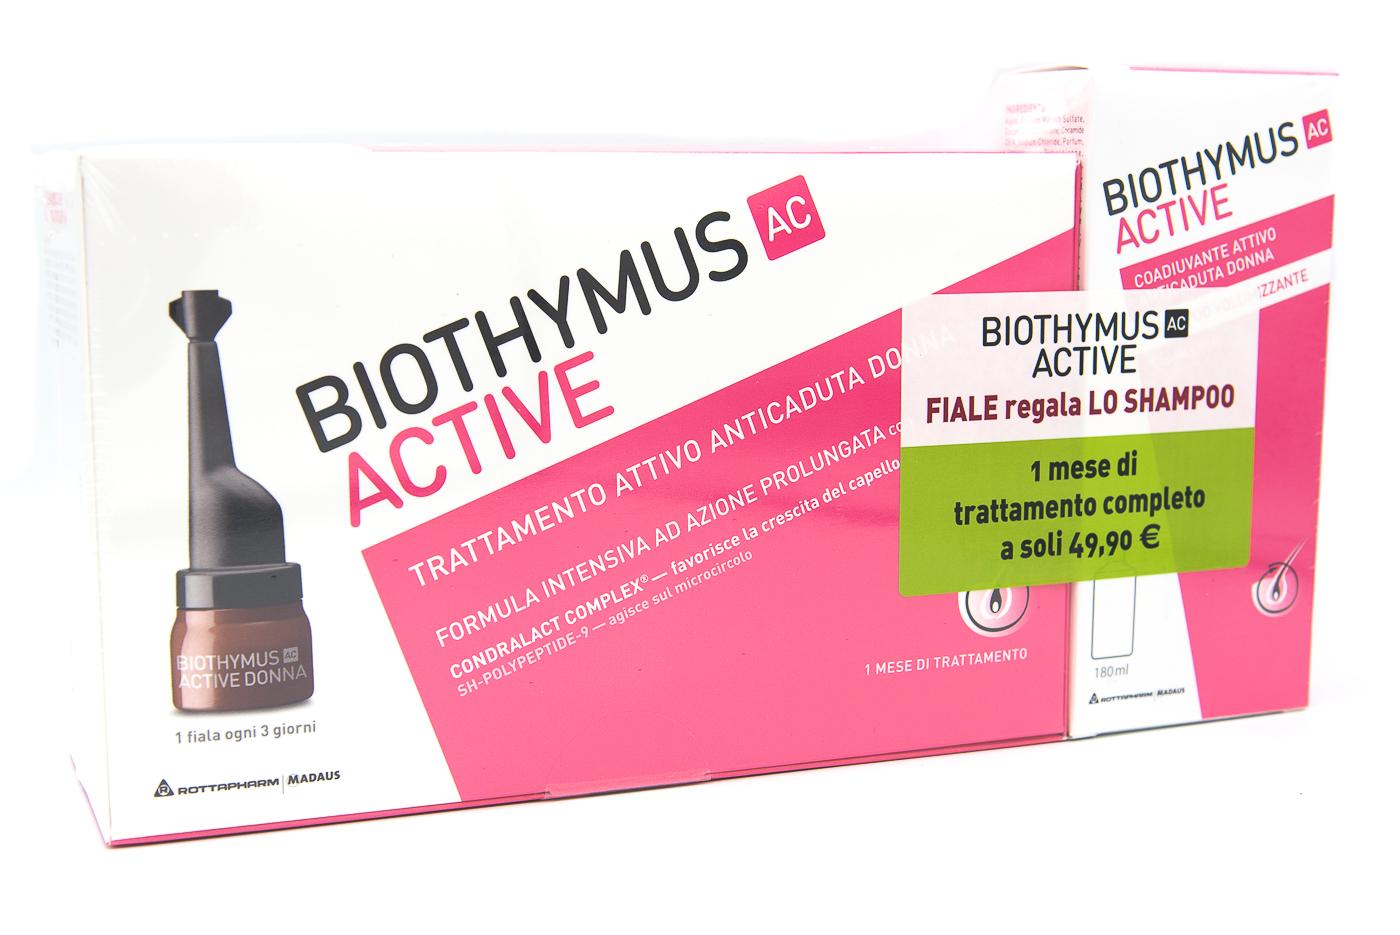 MEDA PHARMA SpA Biothymus Trattamento Donna 10fiale+shampoo Volumizzante 180ml Omaggio